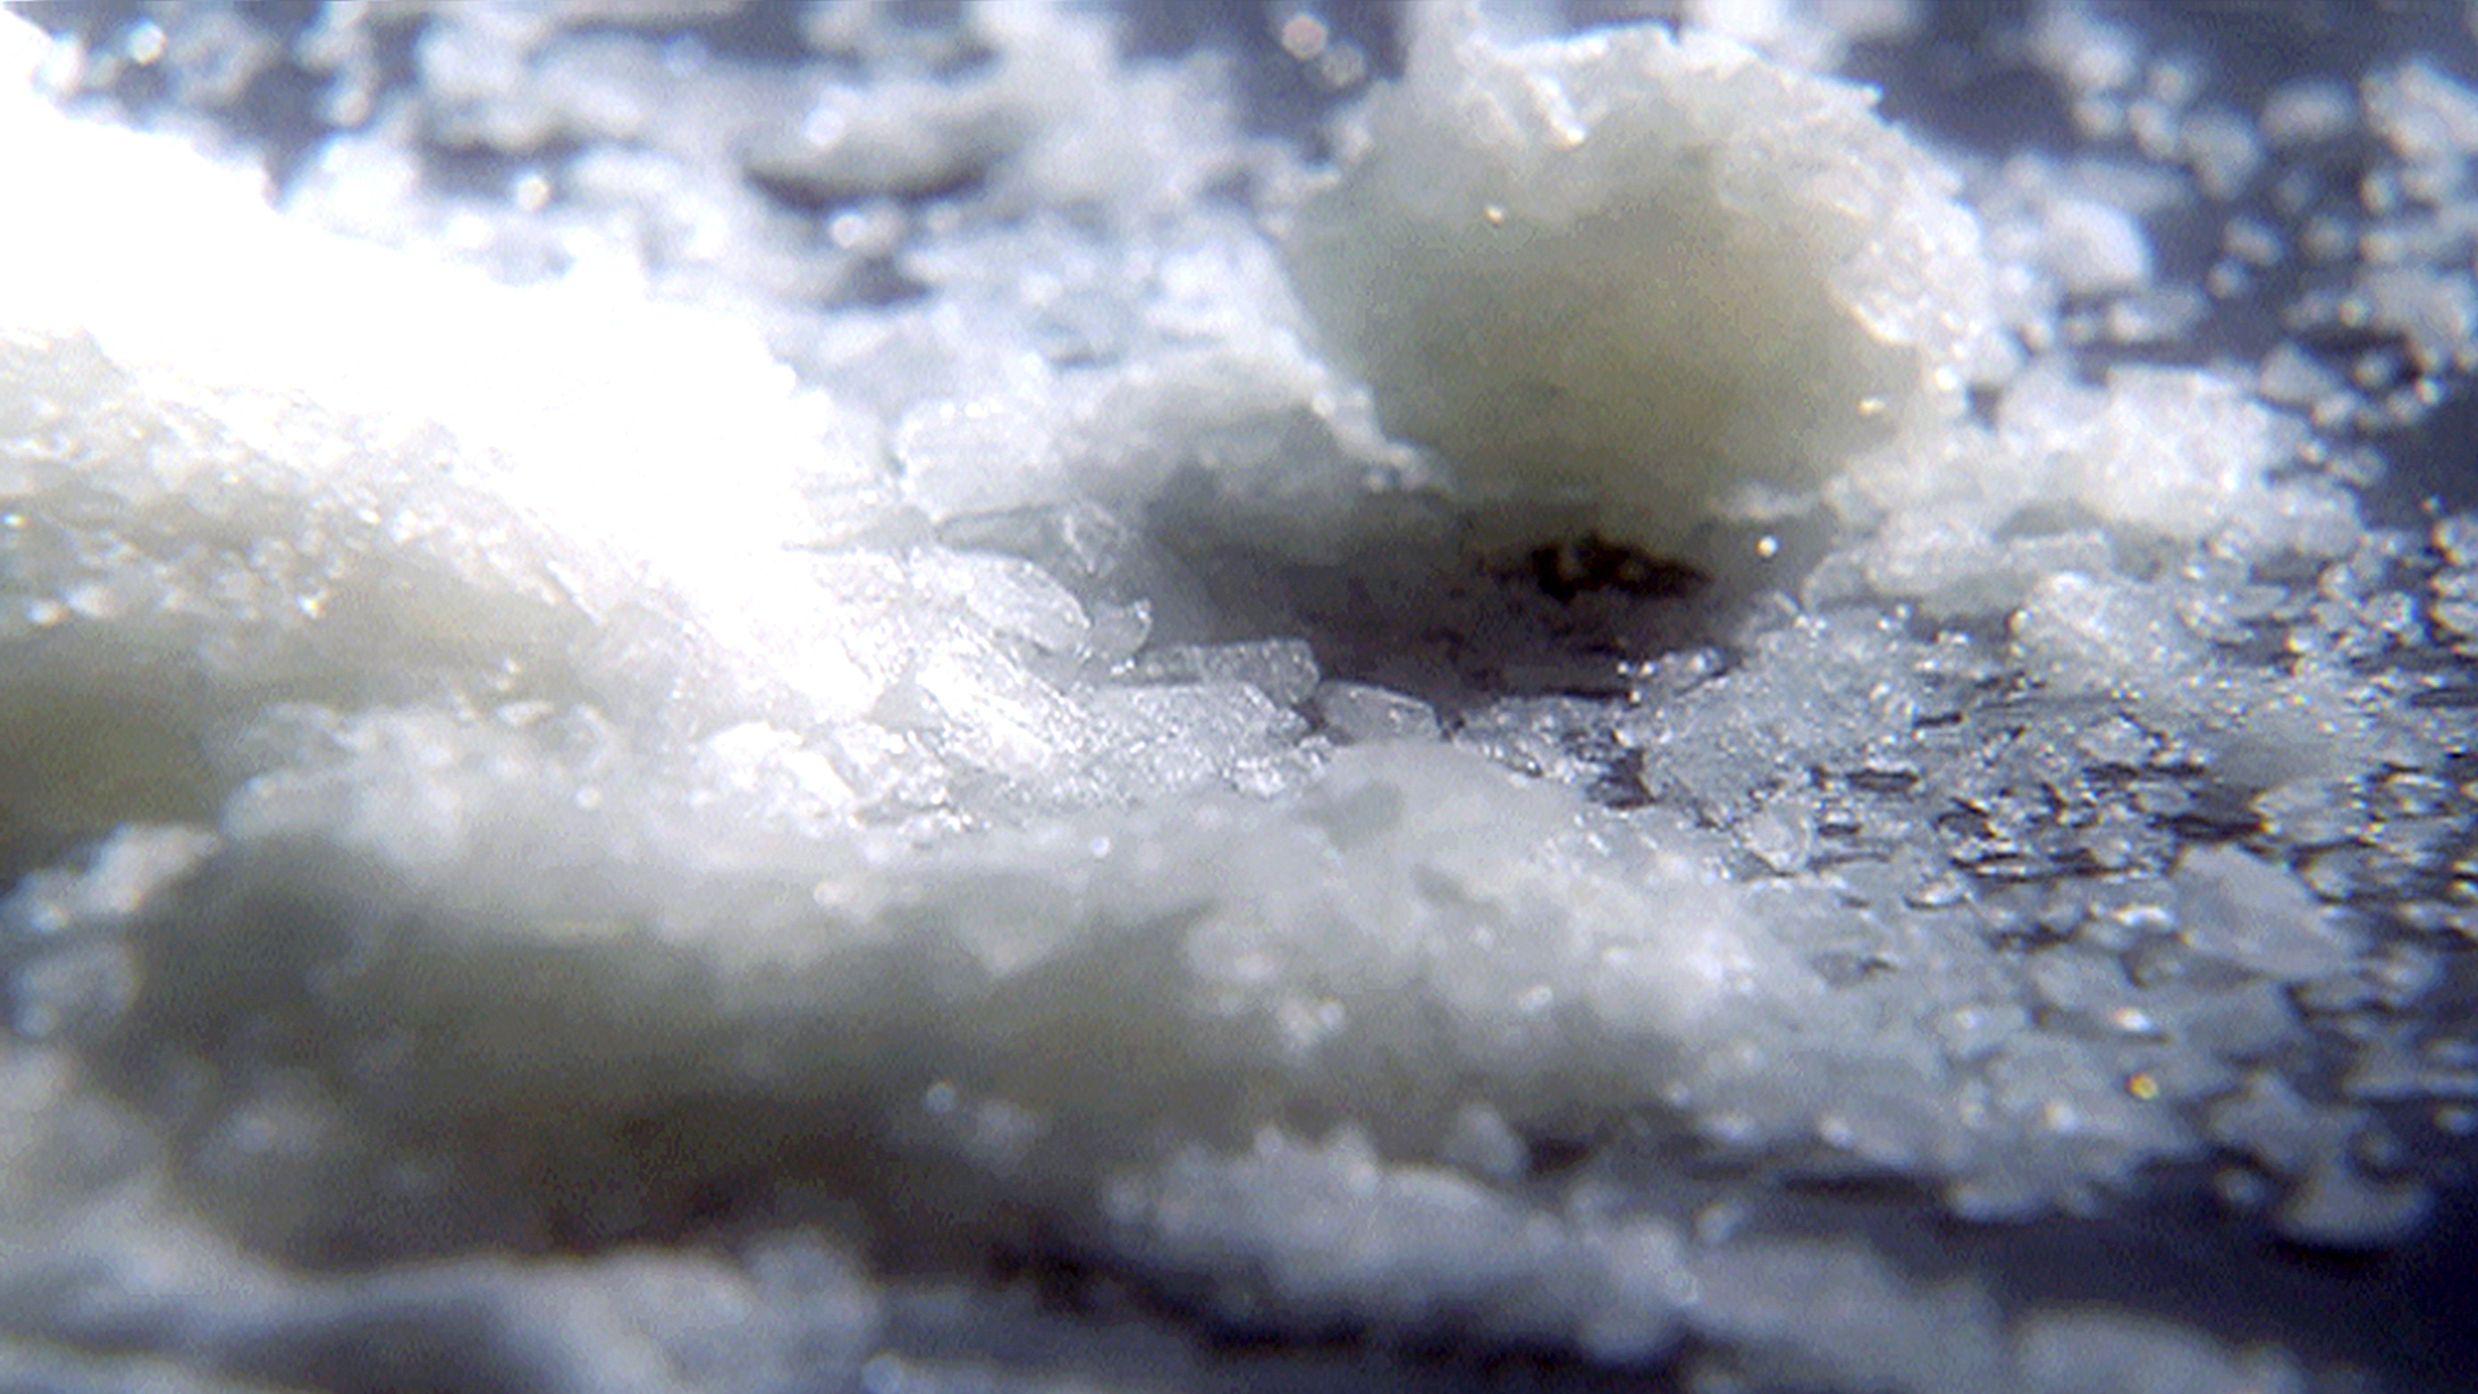 Droge Crystal Meth (Symbolbild)